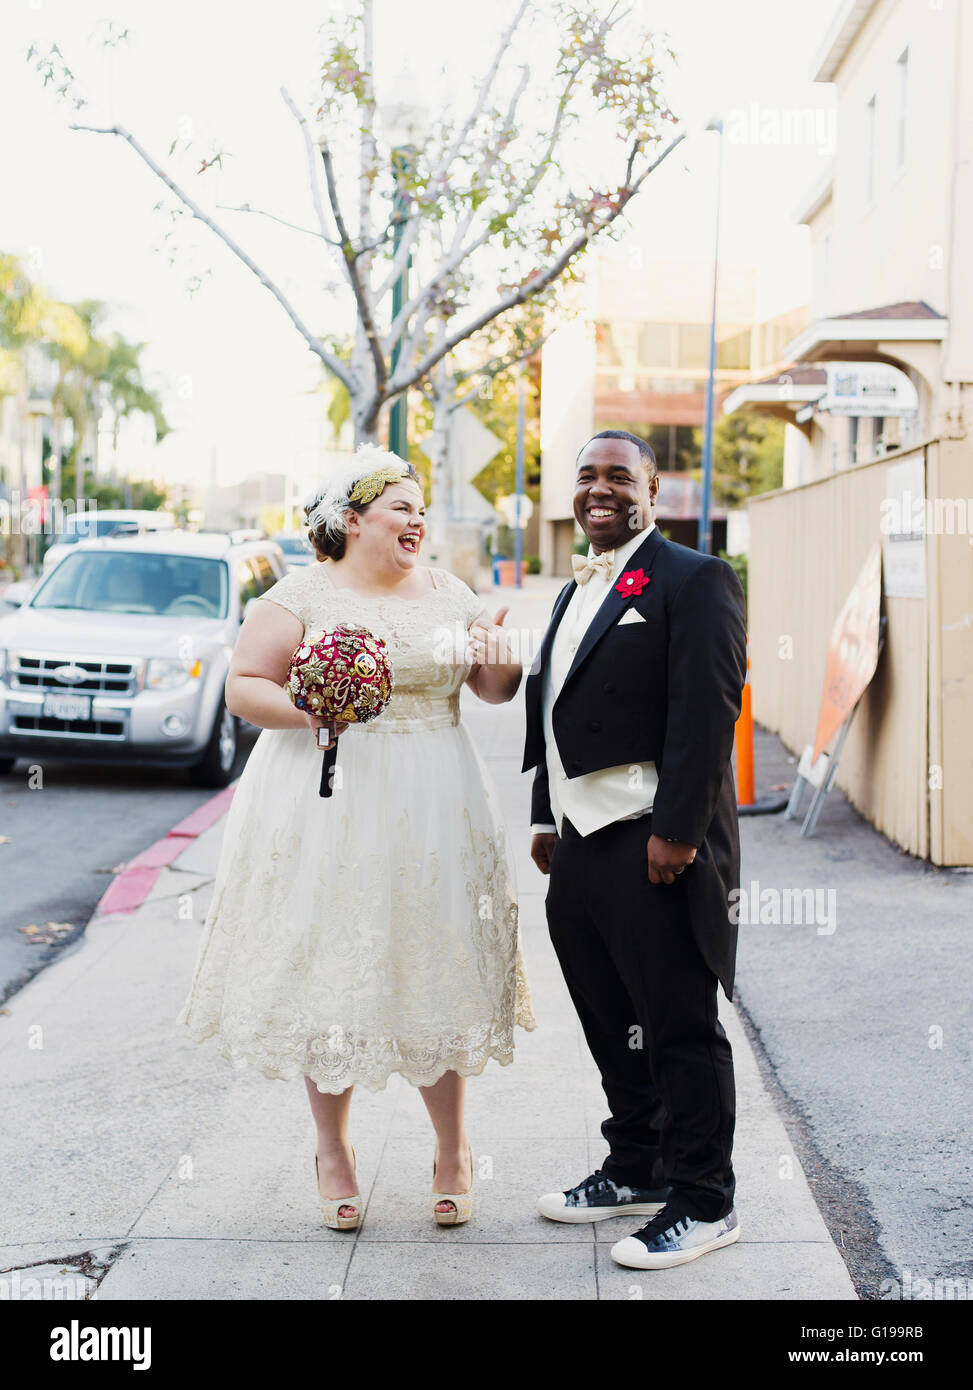 San Diego Wedding Stockfotos & San Diego Wedding Bilder - Alamy